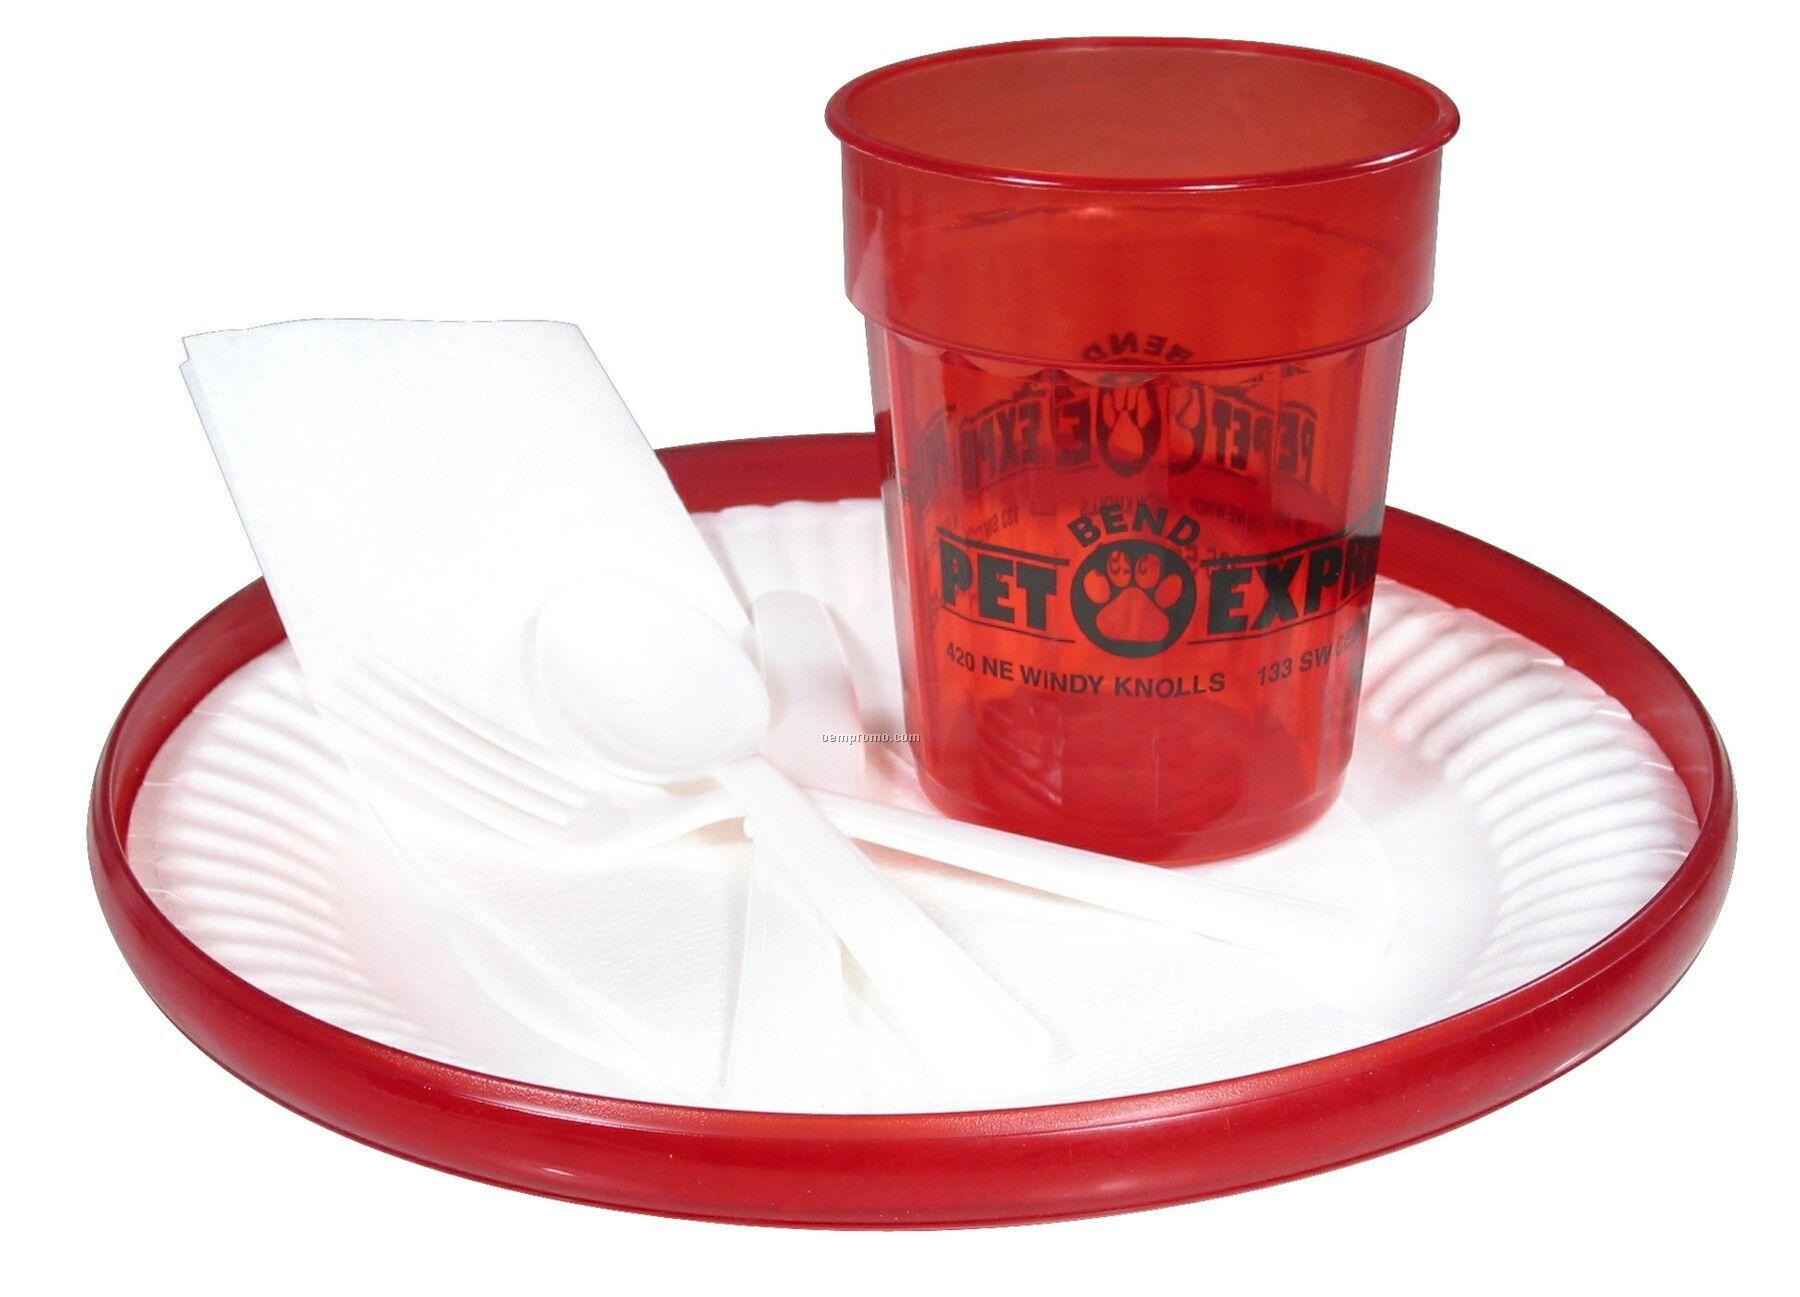 "Humphrey Jewel Buffet Kit W/9-1/4"" Flyer & Stadium Cup"